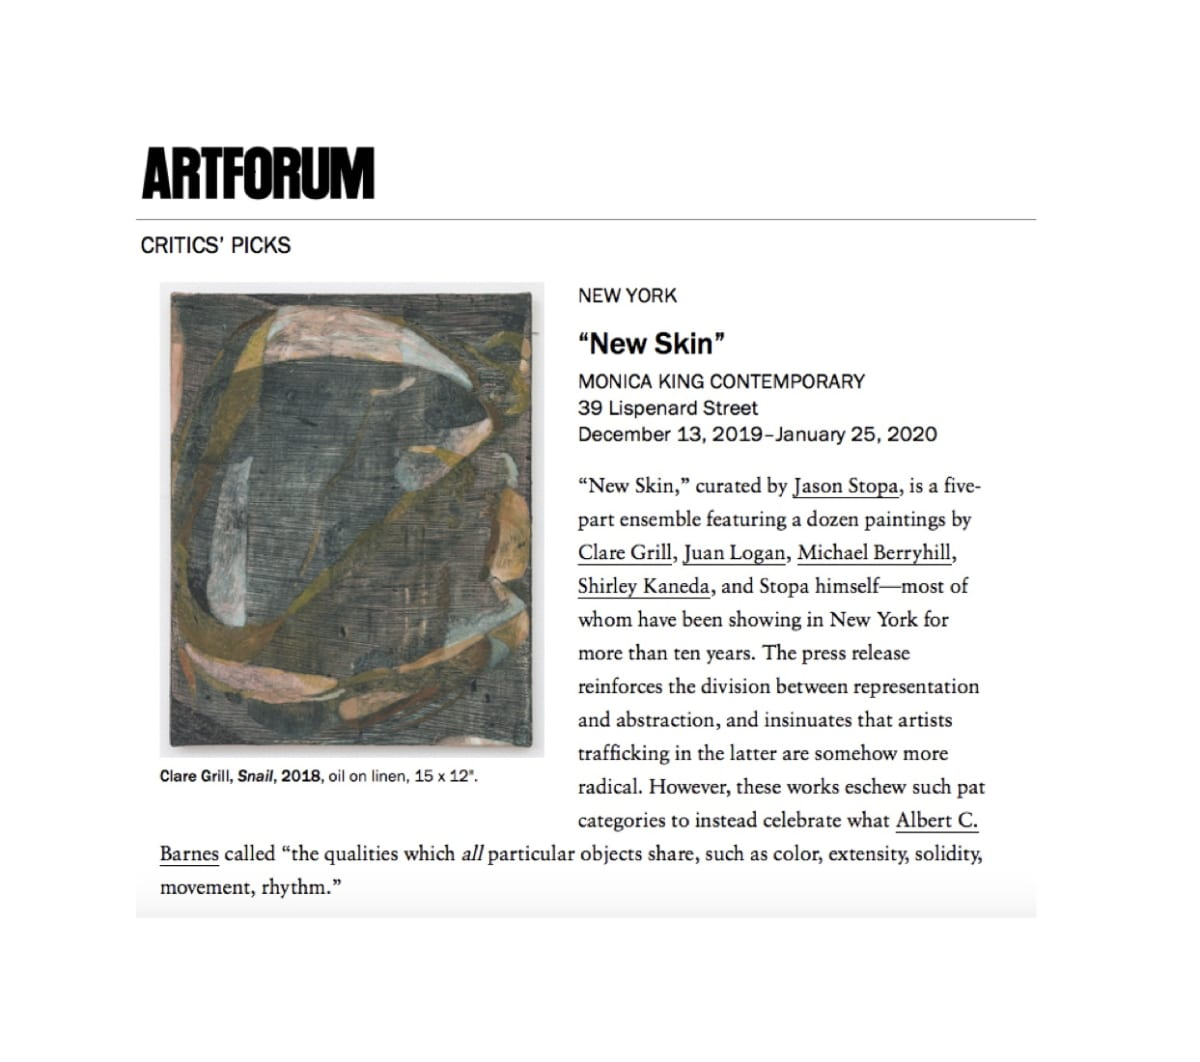 ARTFORUM Critics' Picks